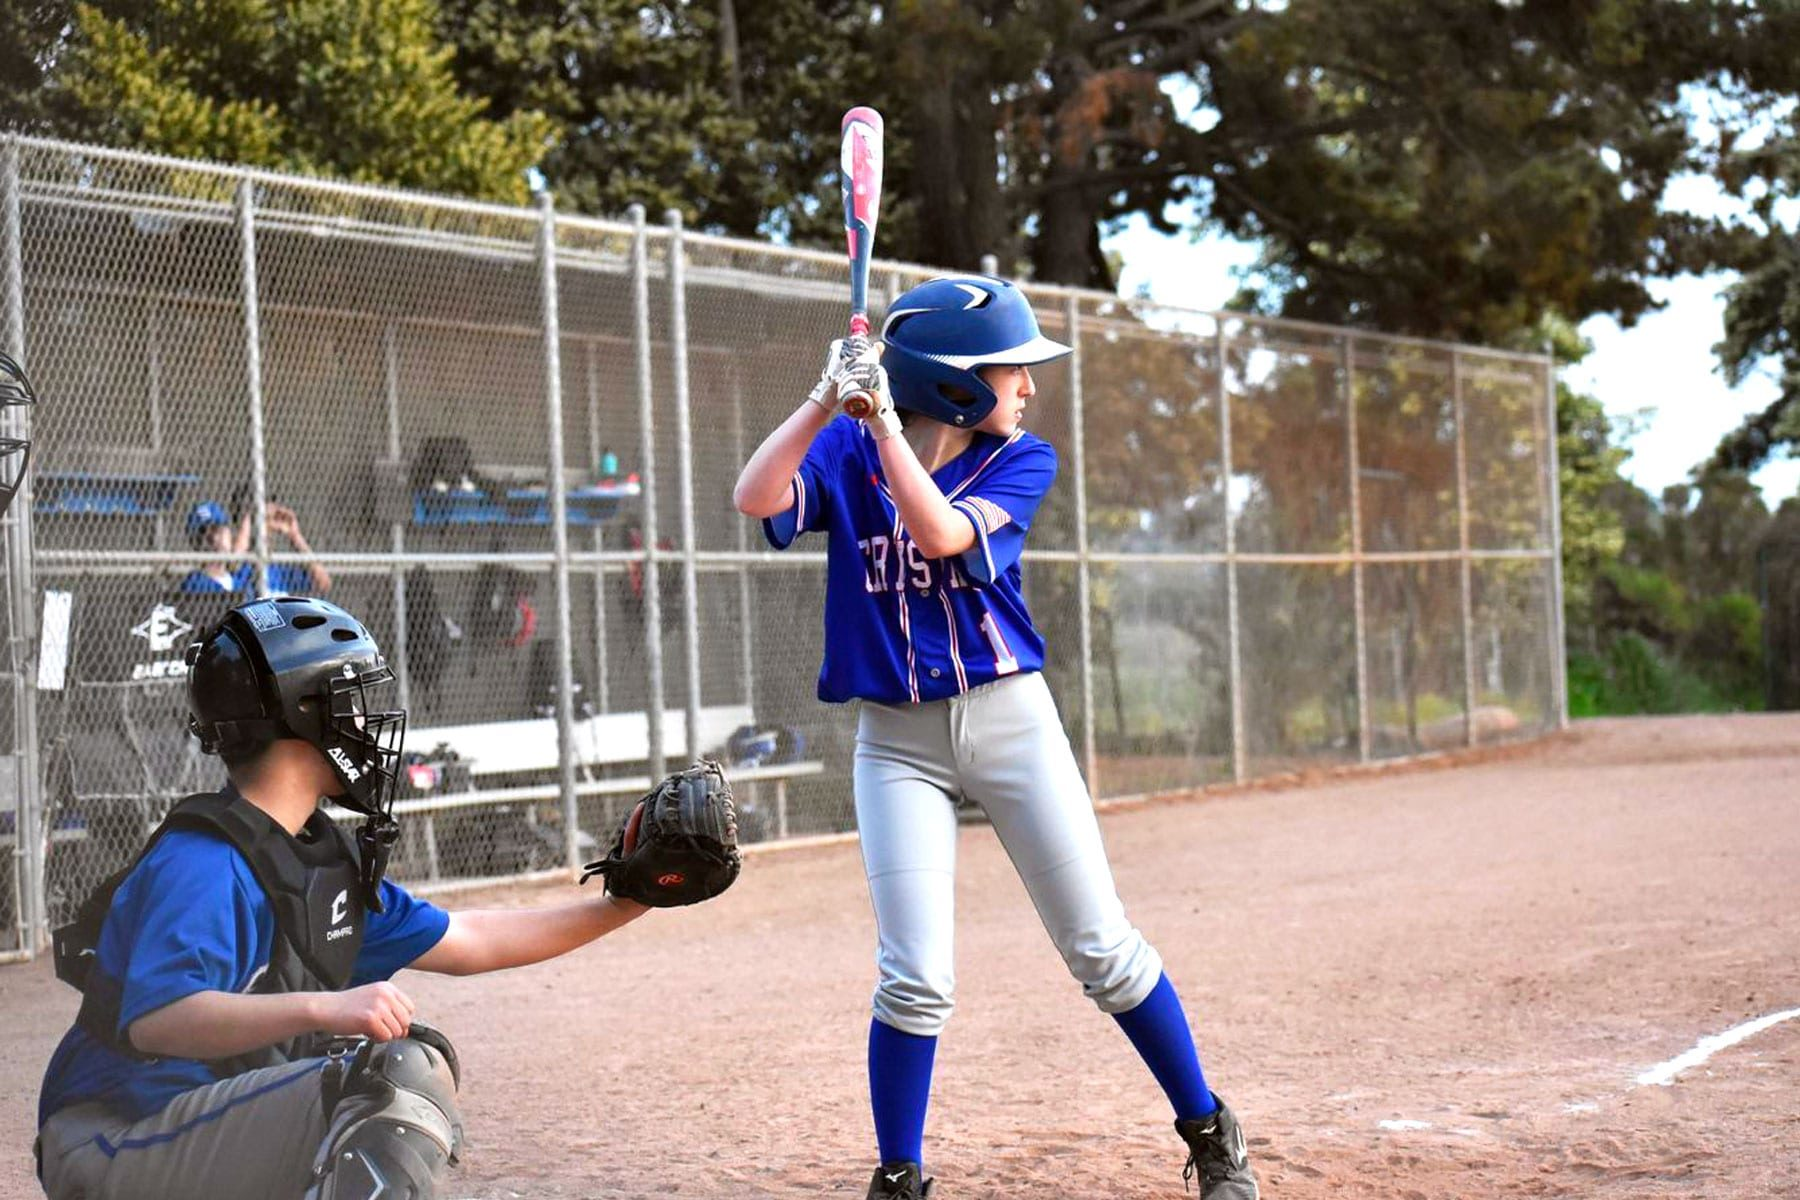 Eliza Schnitzer at bat on a baseball field.